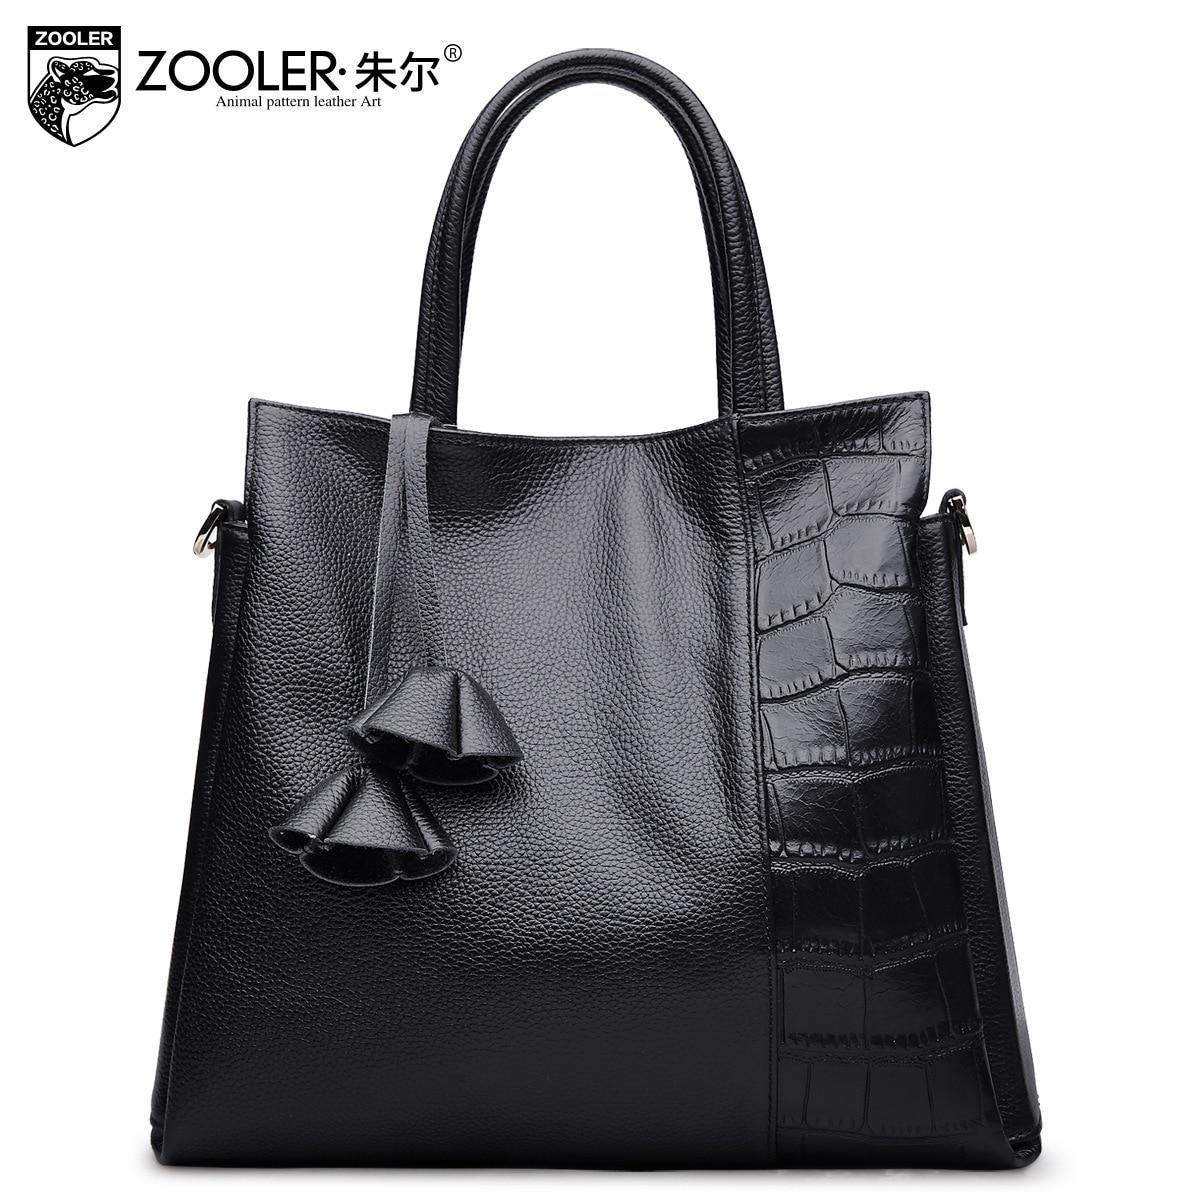 ZOOLER Guarantee 100% Genuine Leather Handbag 2017 New Fashion Large Capacity Ladies Business Tote Bags for Women Messenger Bag